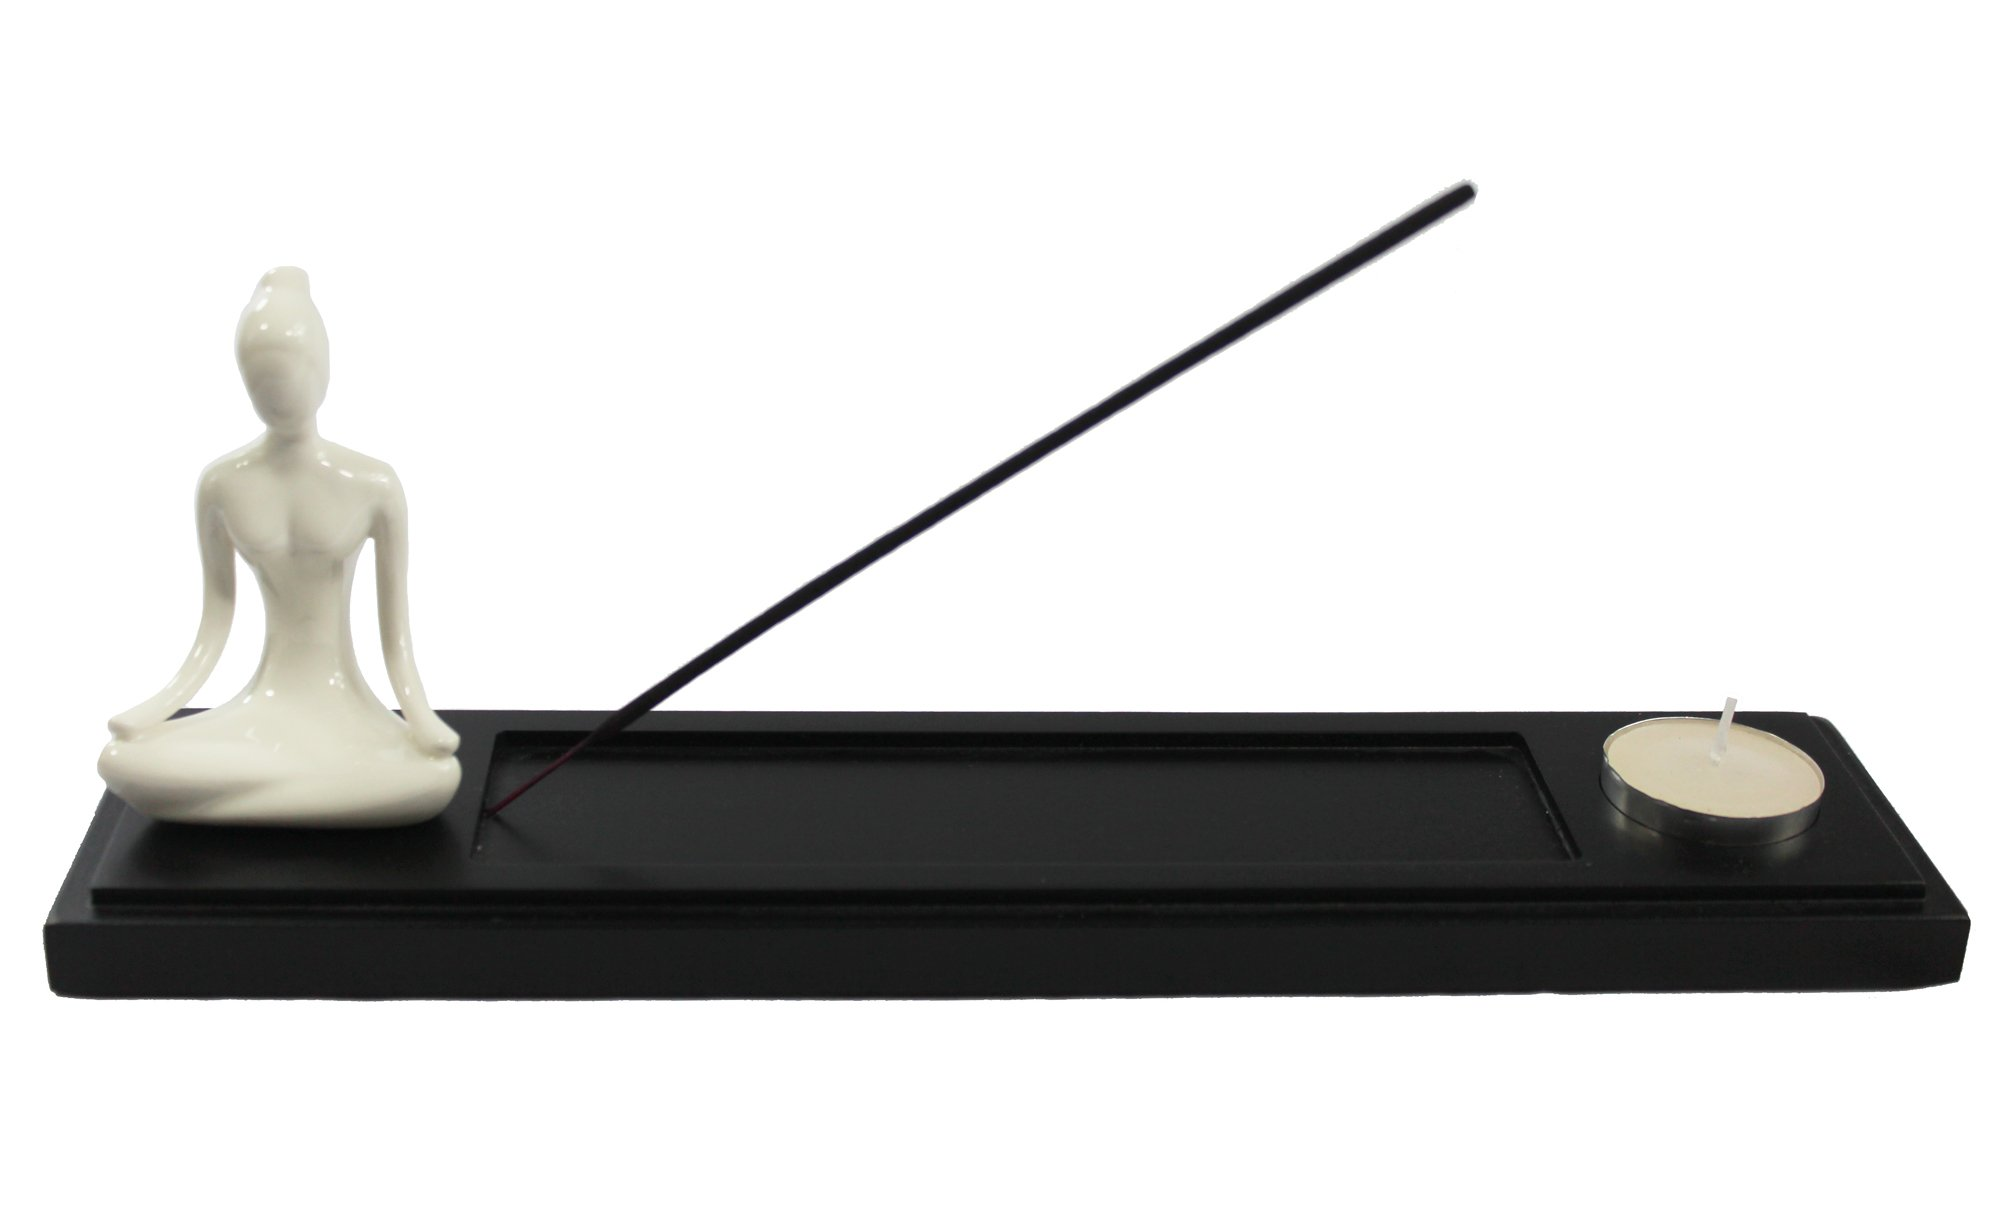 Black Wood Incense Burner Holder Tray with Yoga Lotus Pose Figurine